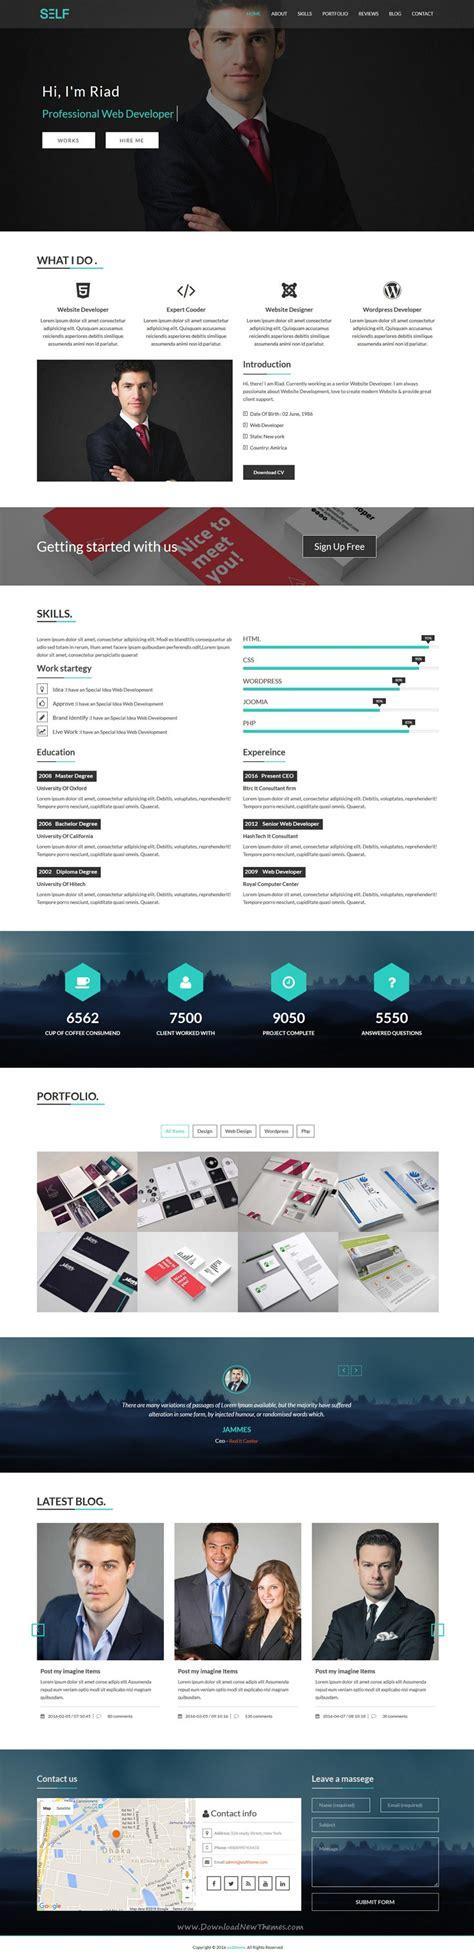 clean elegant design bootstrap html template page portfolio